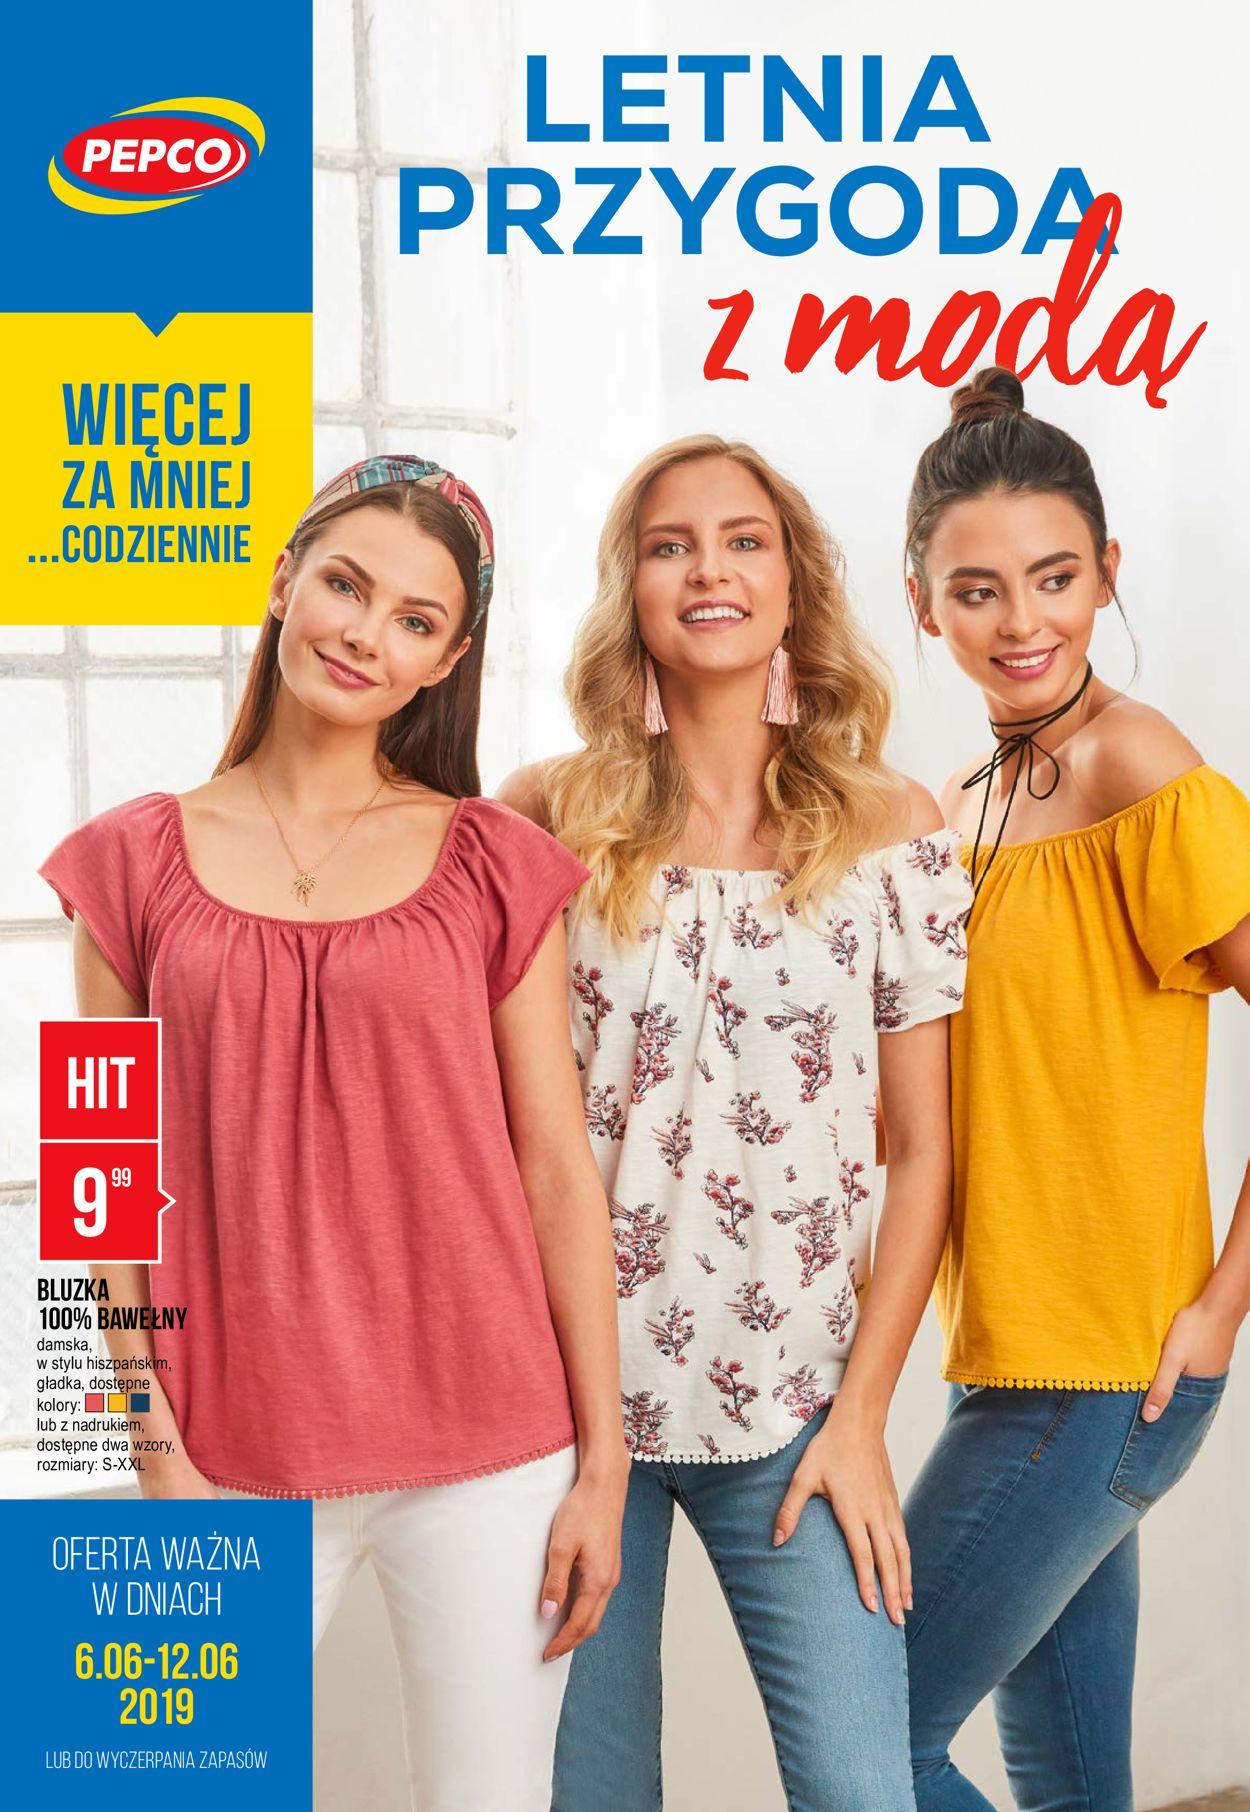 Gazetka promocyjna Pepco - 06.06-12.06.2019